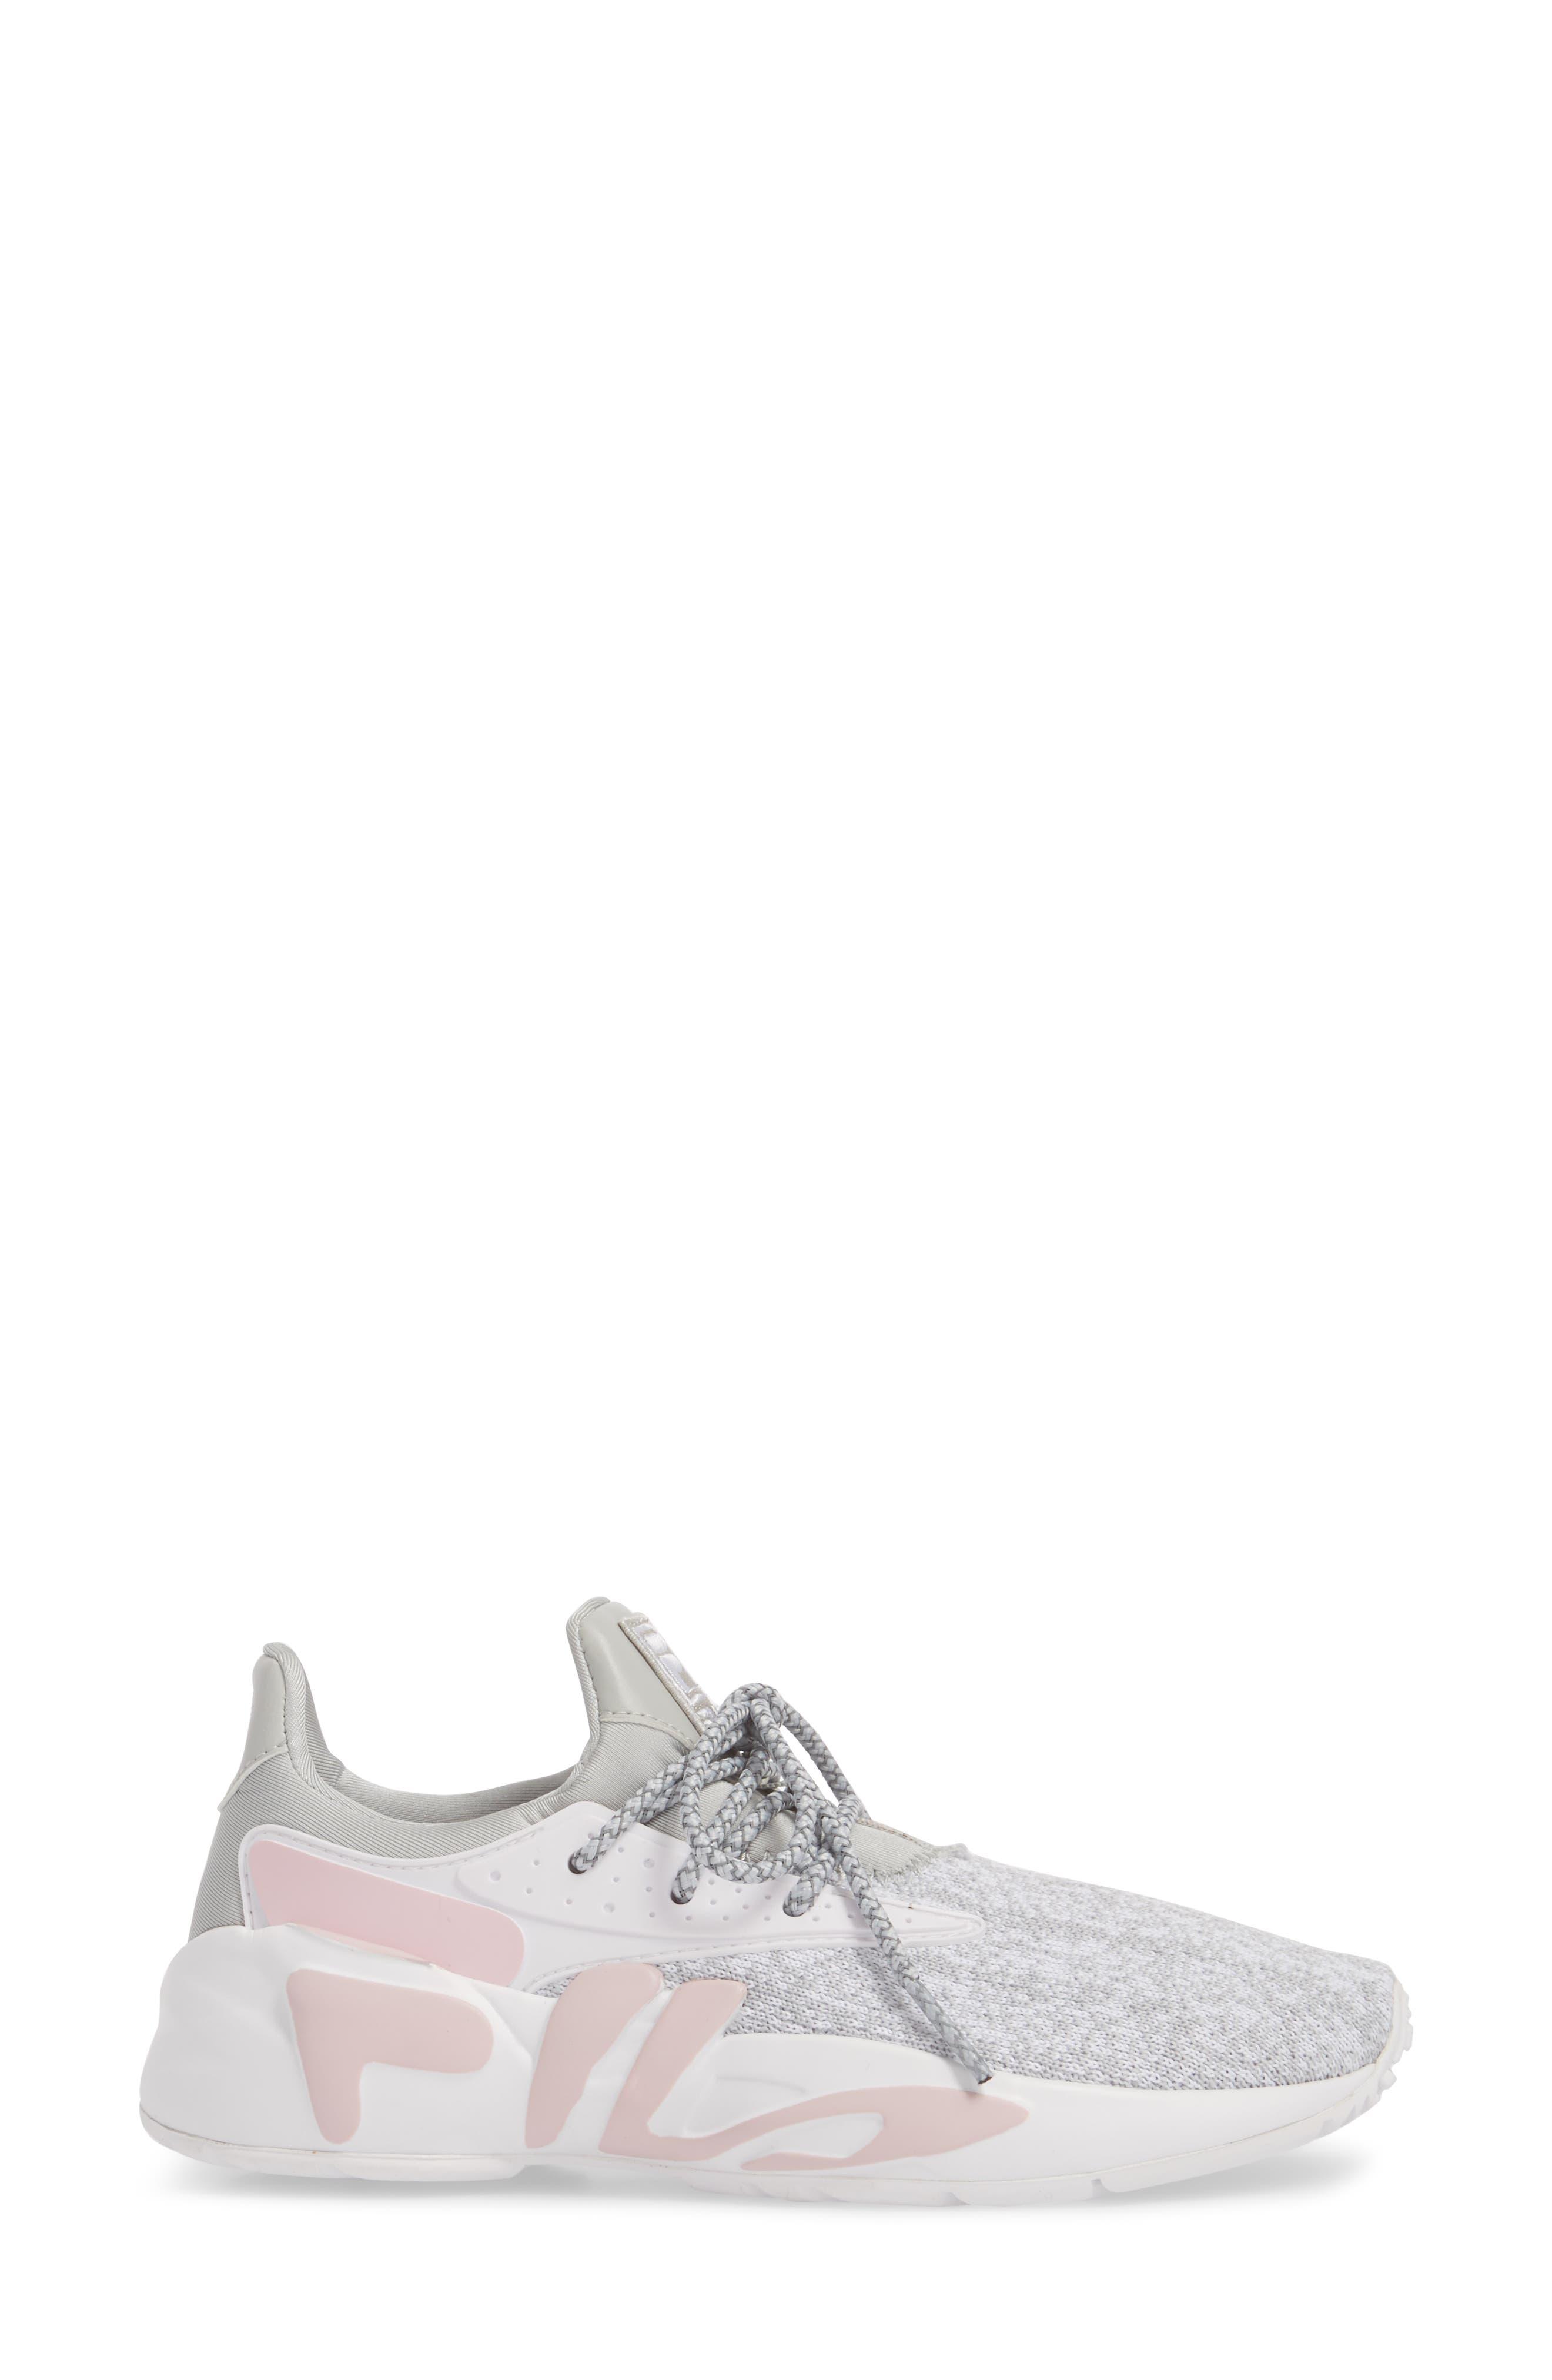 Mindbreaker 2.0 Sneaker,                             Alternate thumbnail 3, color,                             HIGHRISE/ WHITE/ CHALK PINK